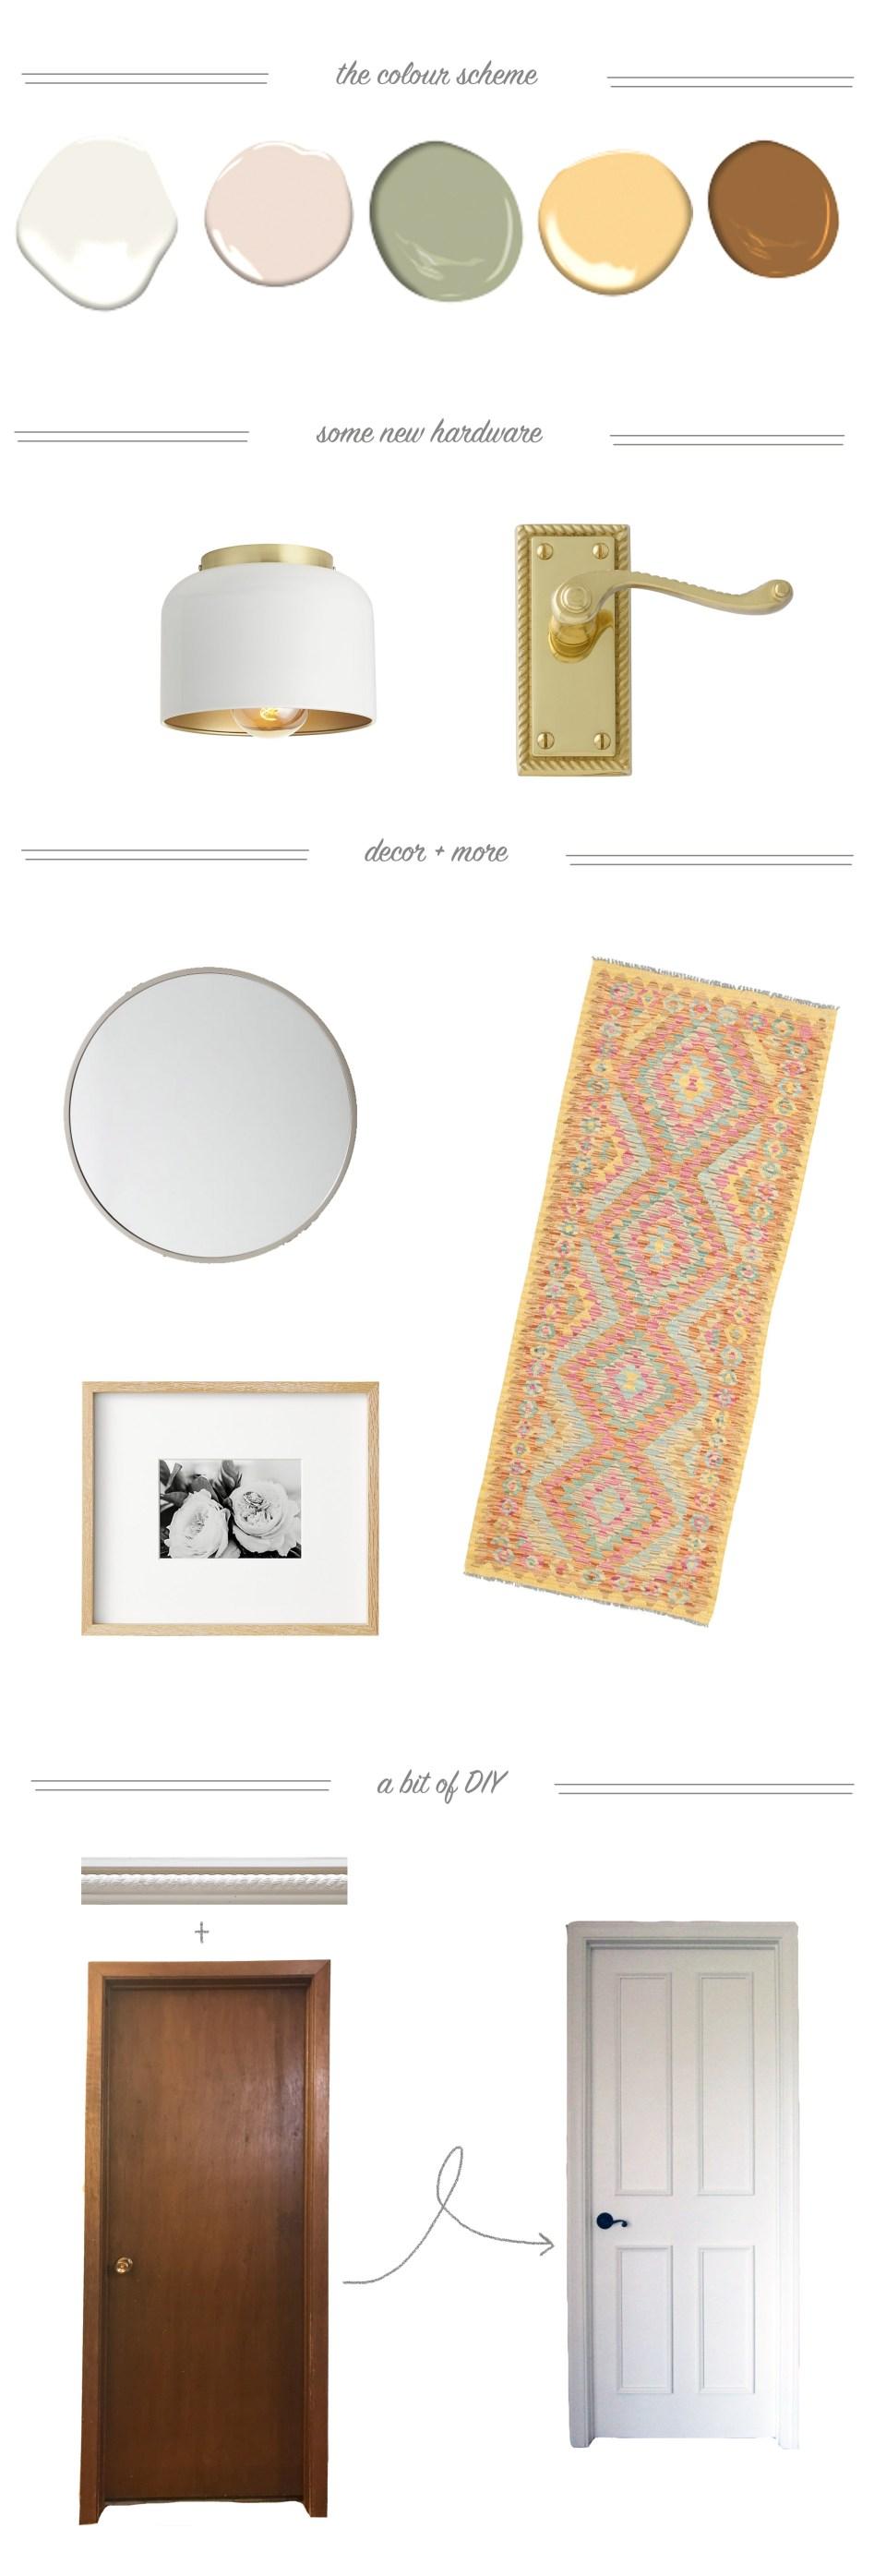 Threads & Blooms - Hallway Makeover Plans